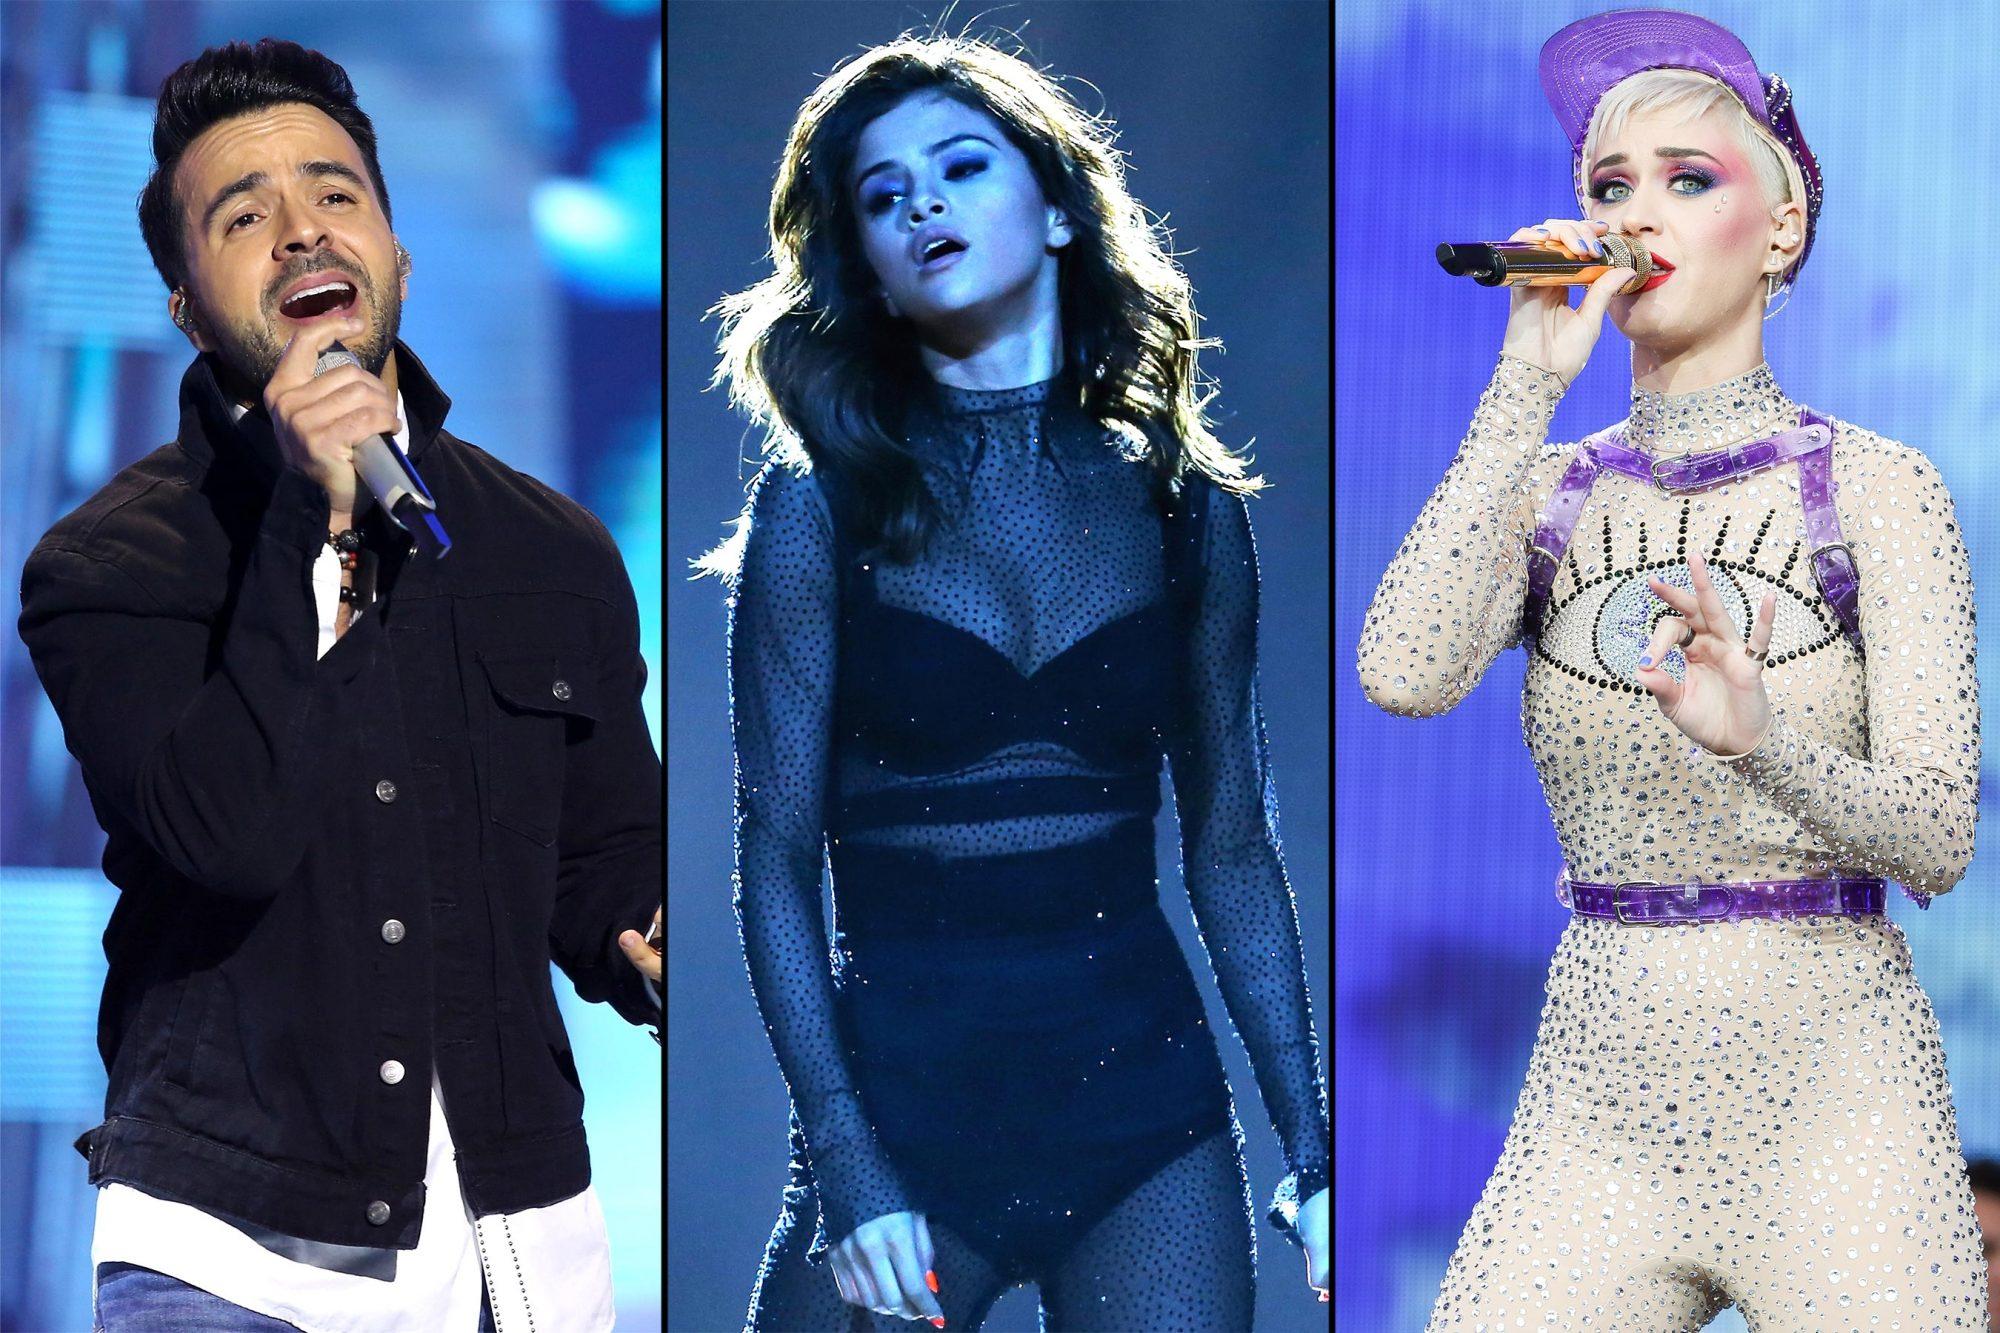 Luis-Fonsi-Selena-Gomez-Katy-Perry